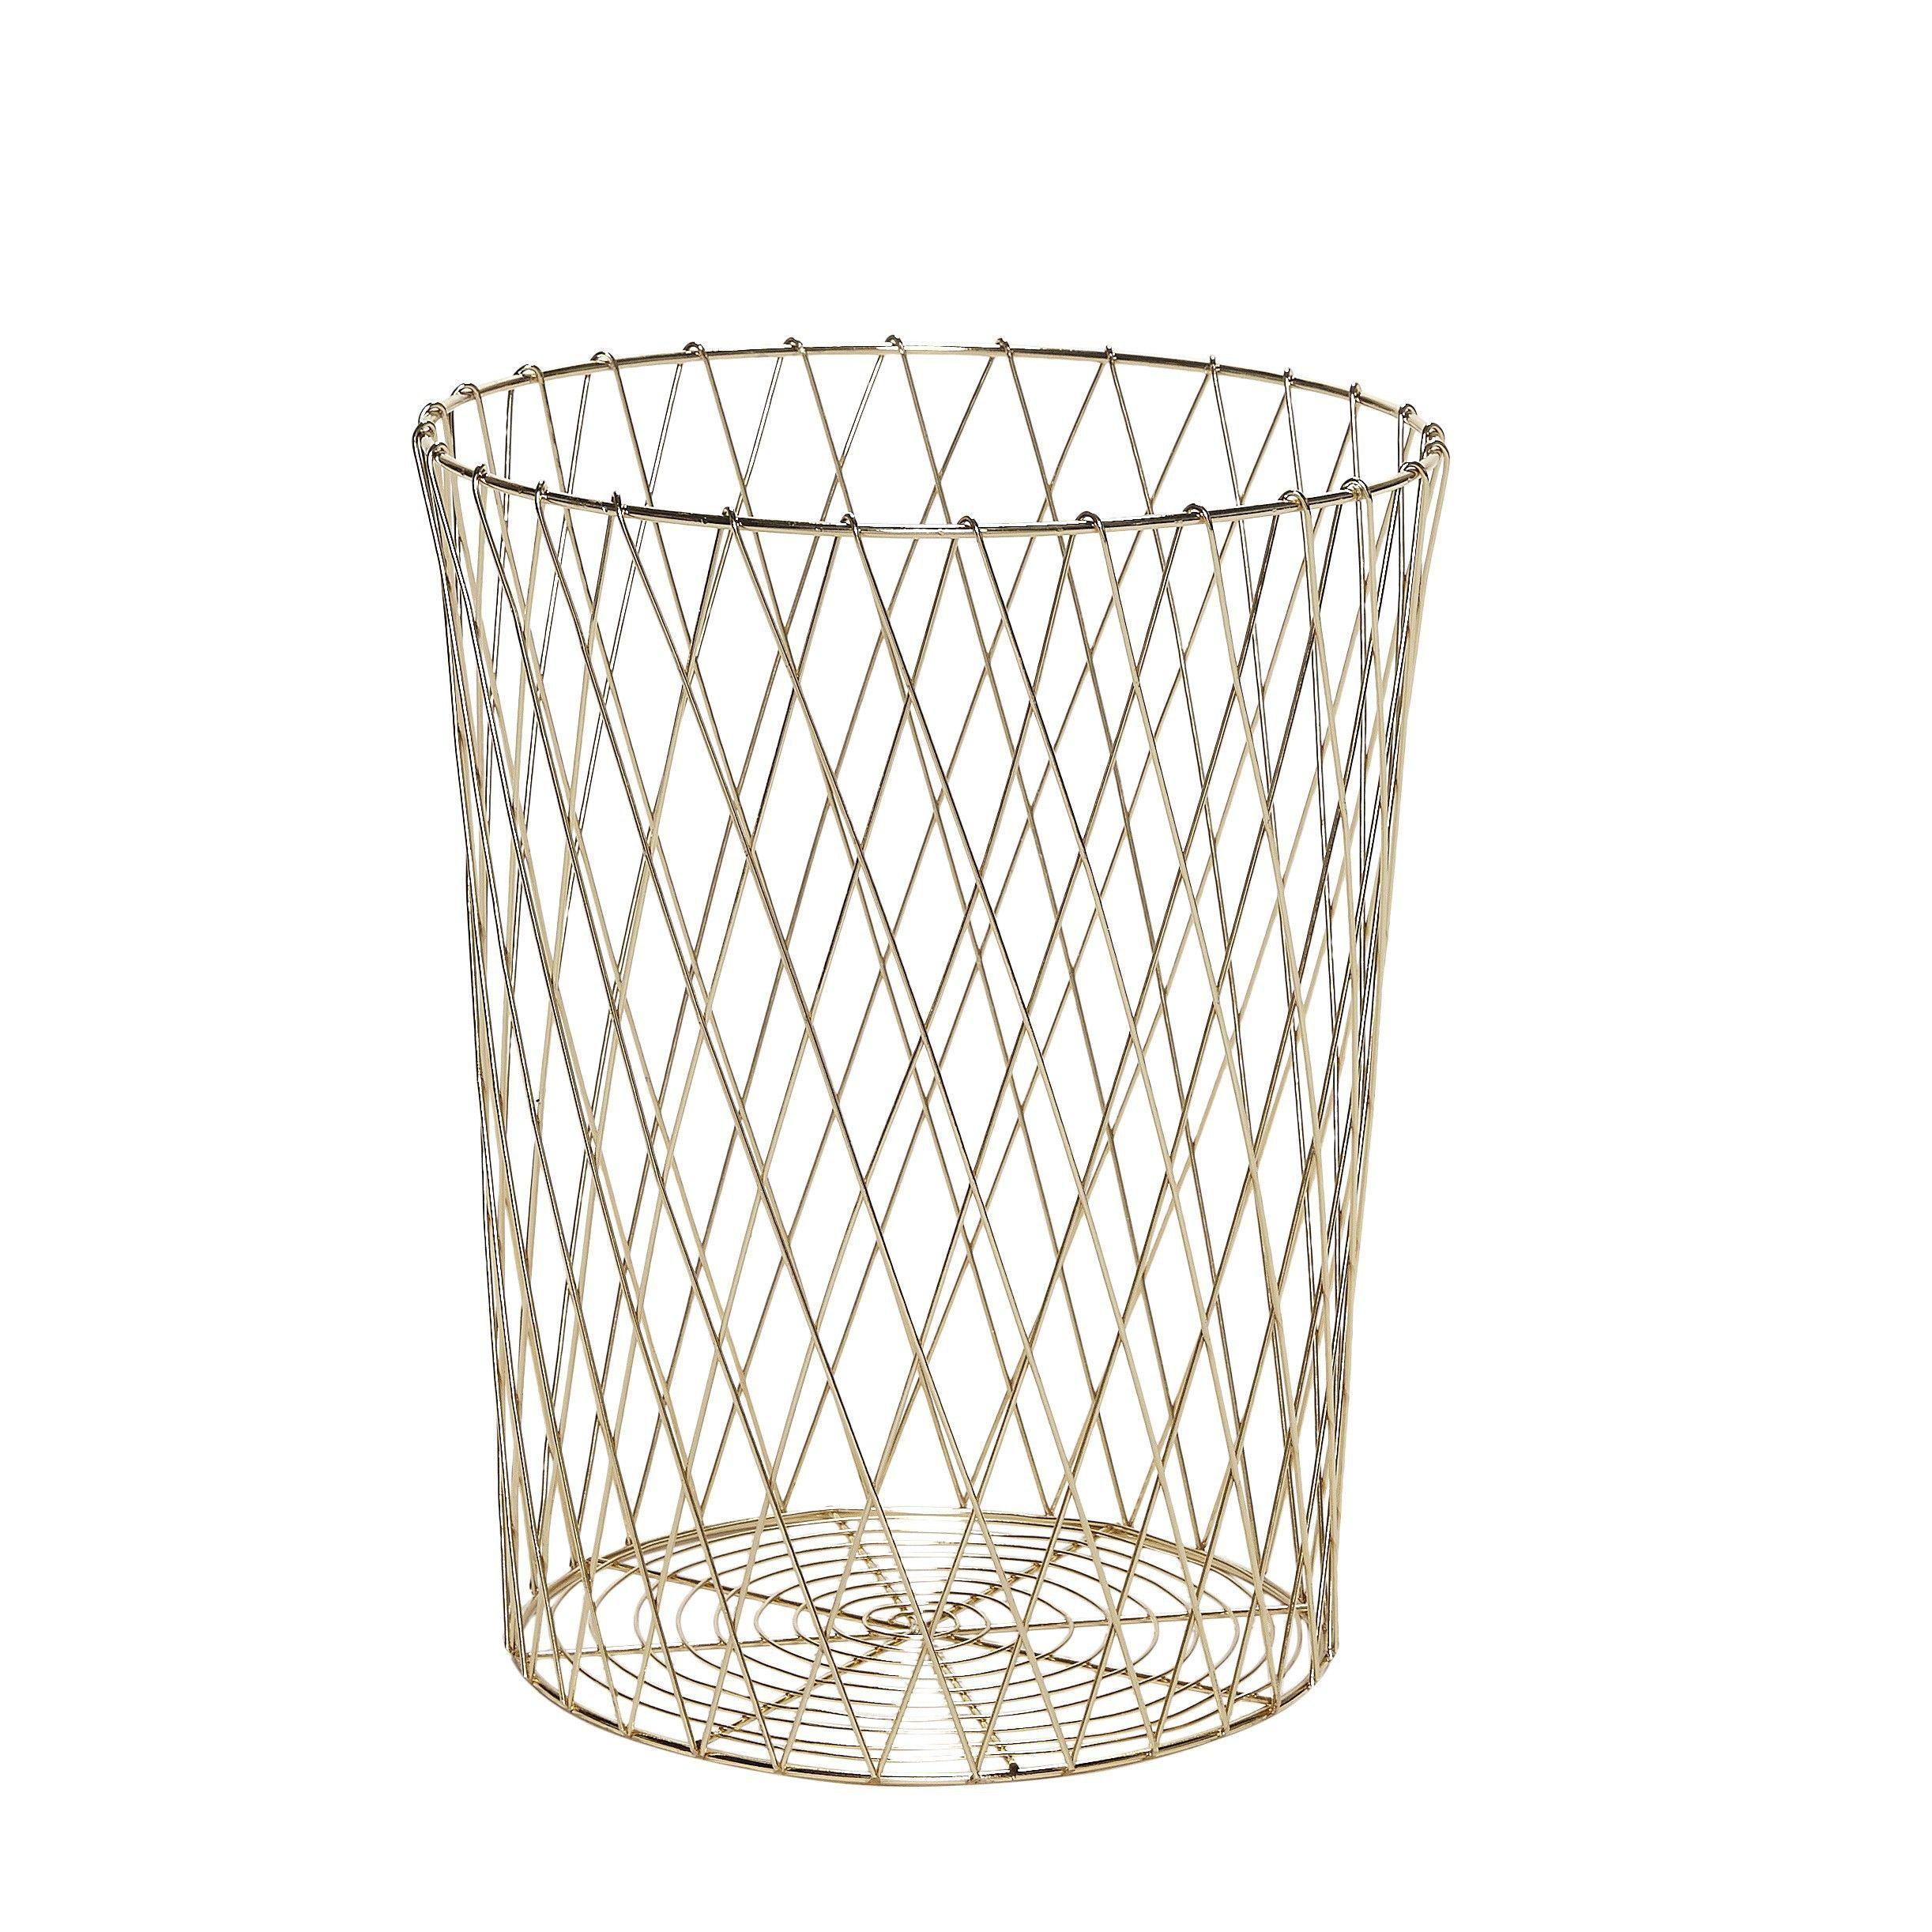 papierkorb rund metall b ro pinterest papierkorb. Black Bedroom Furniture Sets. Home Design Ideas